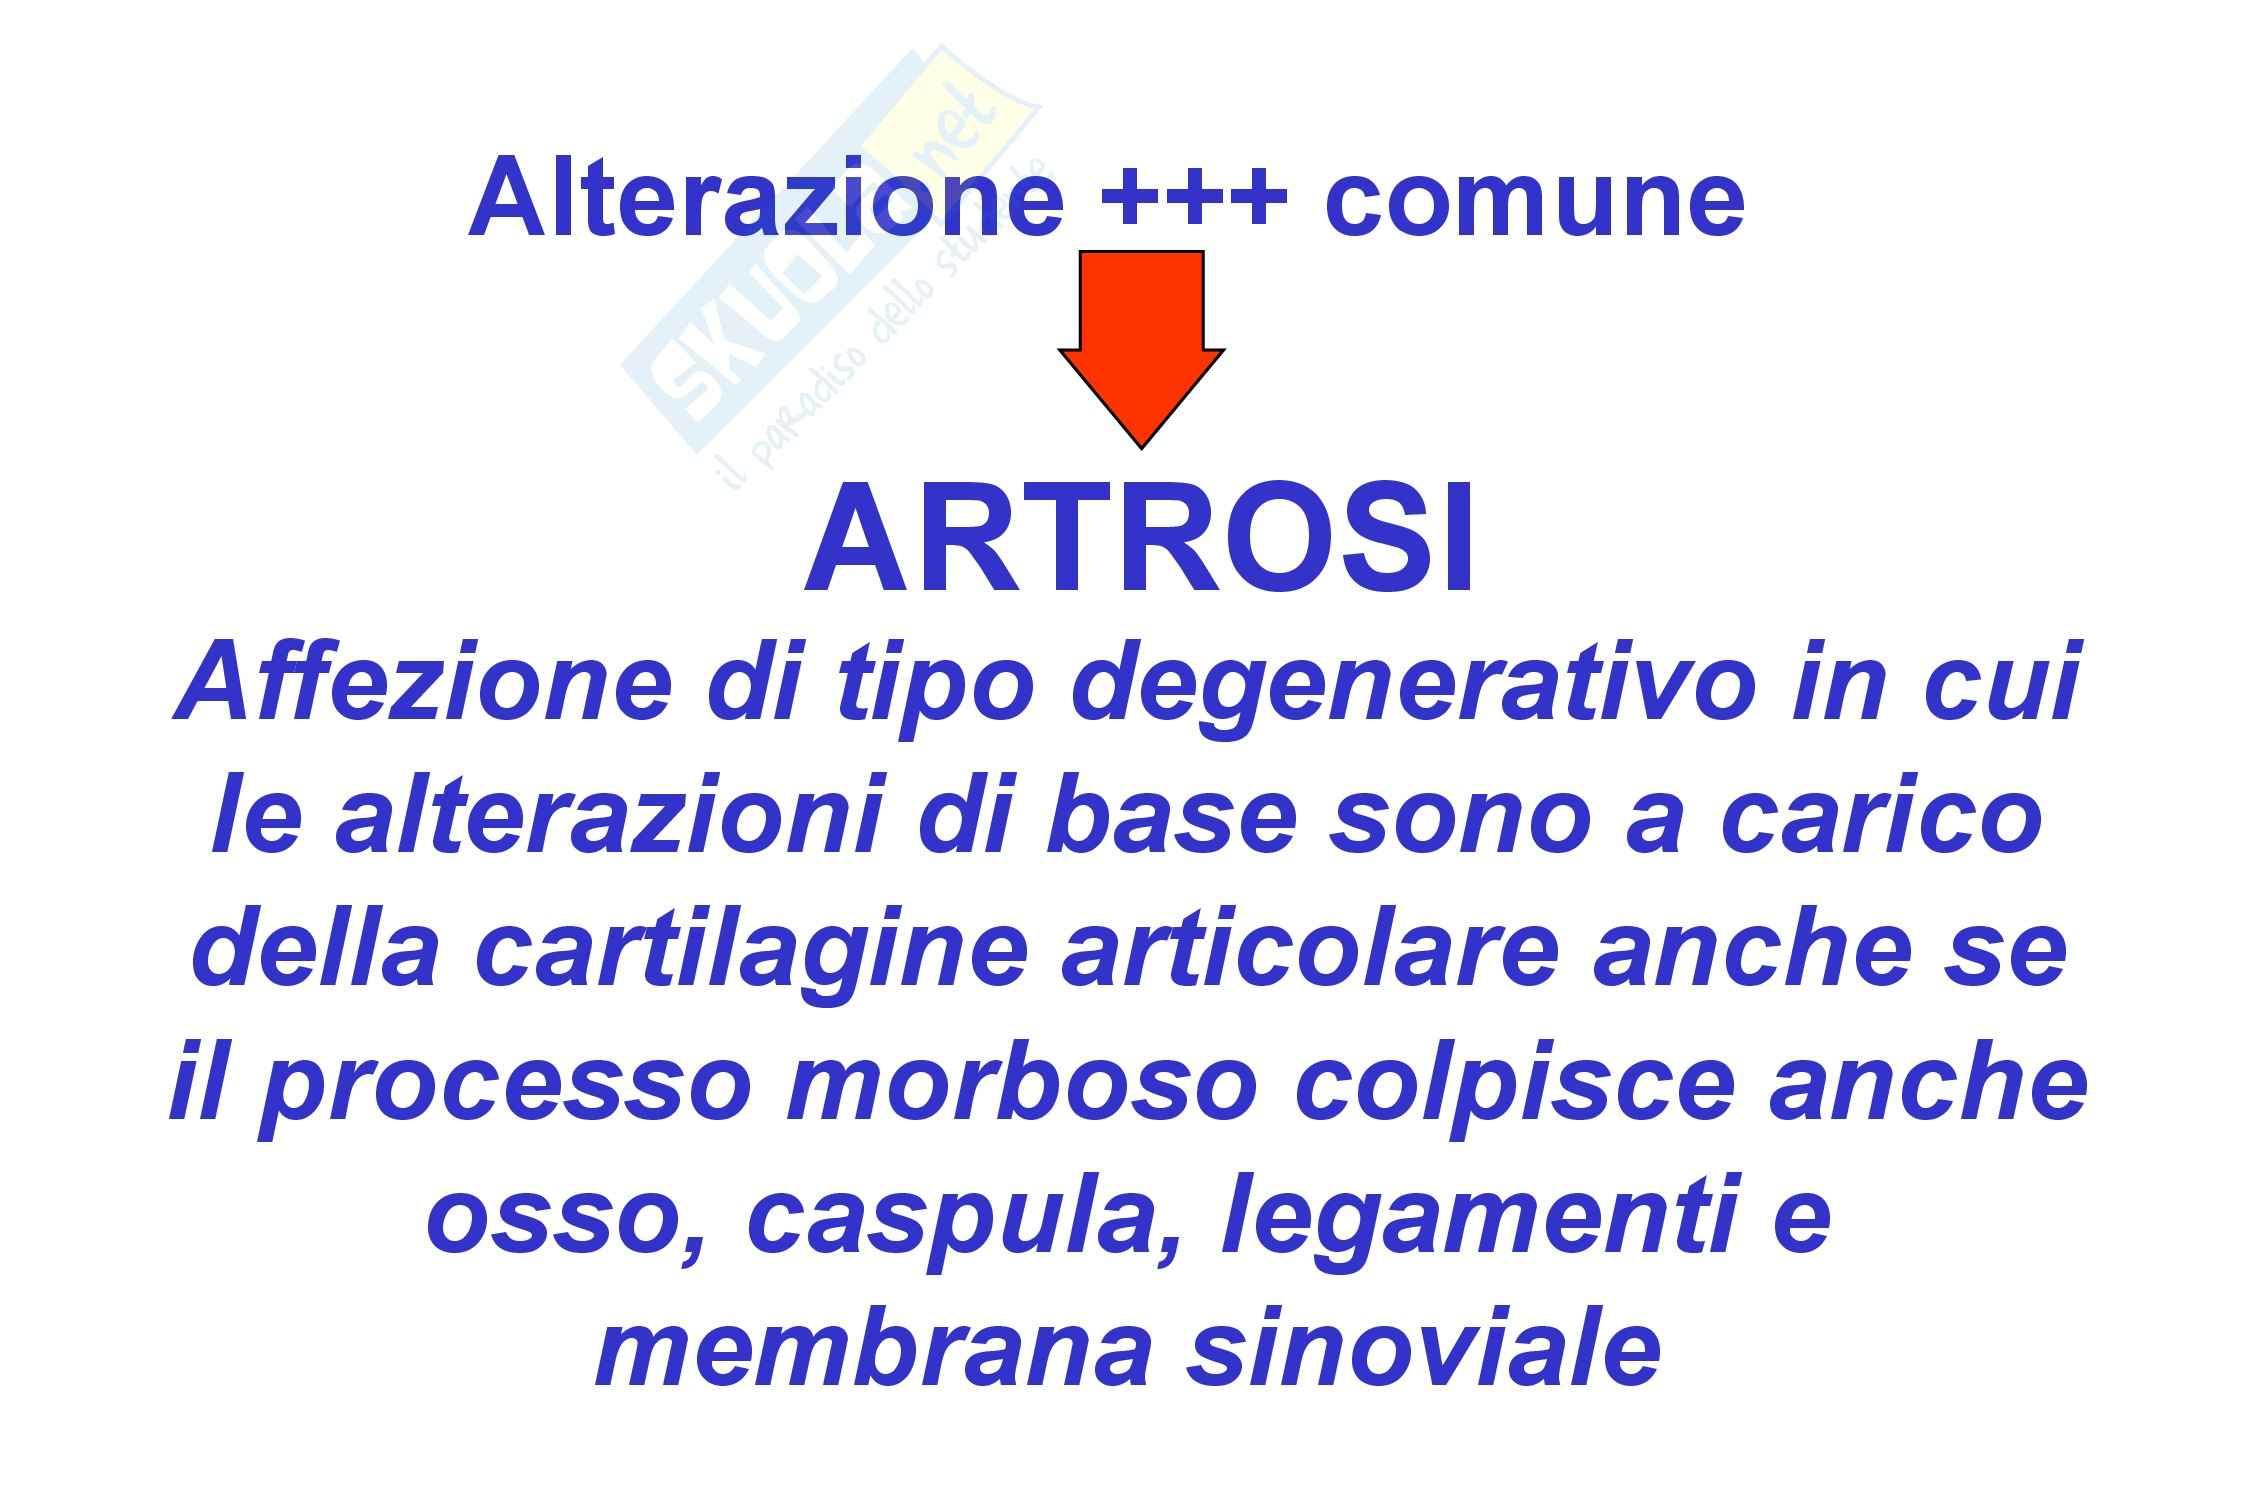 Artrosi - Ortopedia Pag. 6